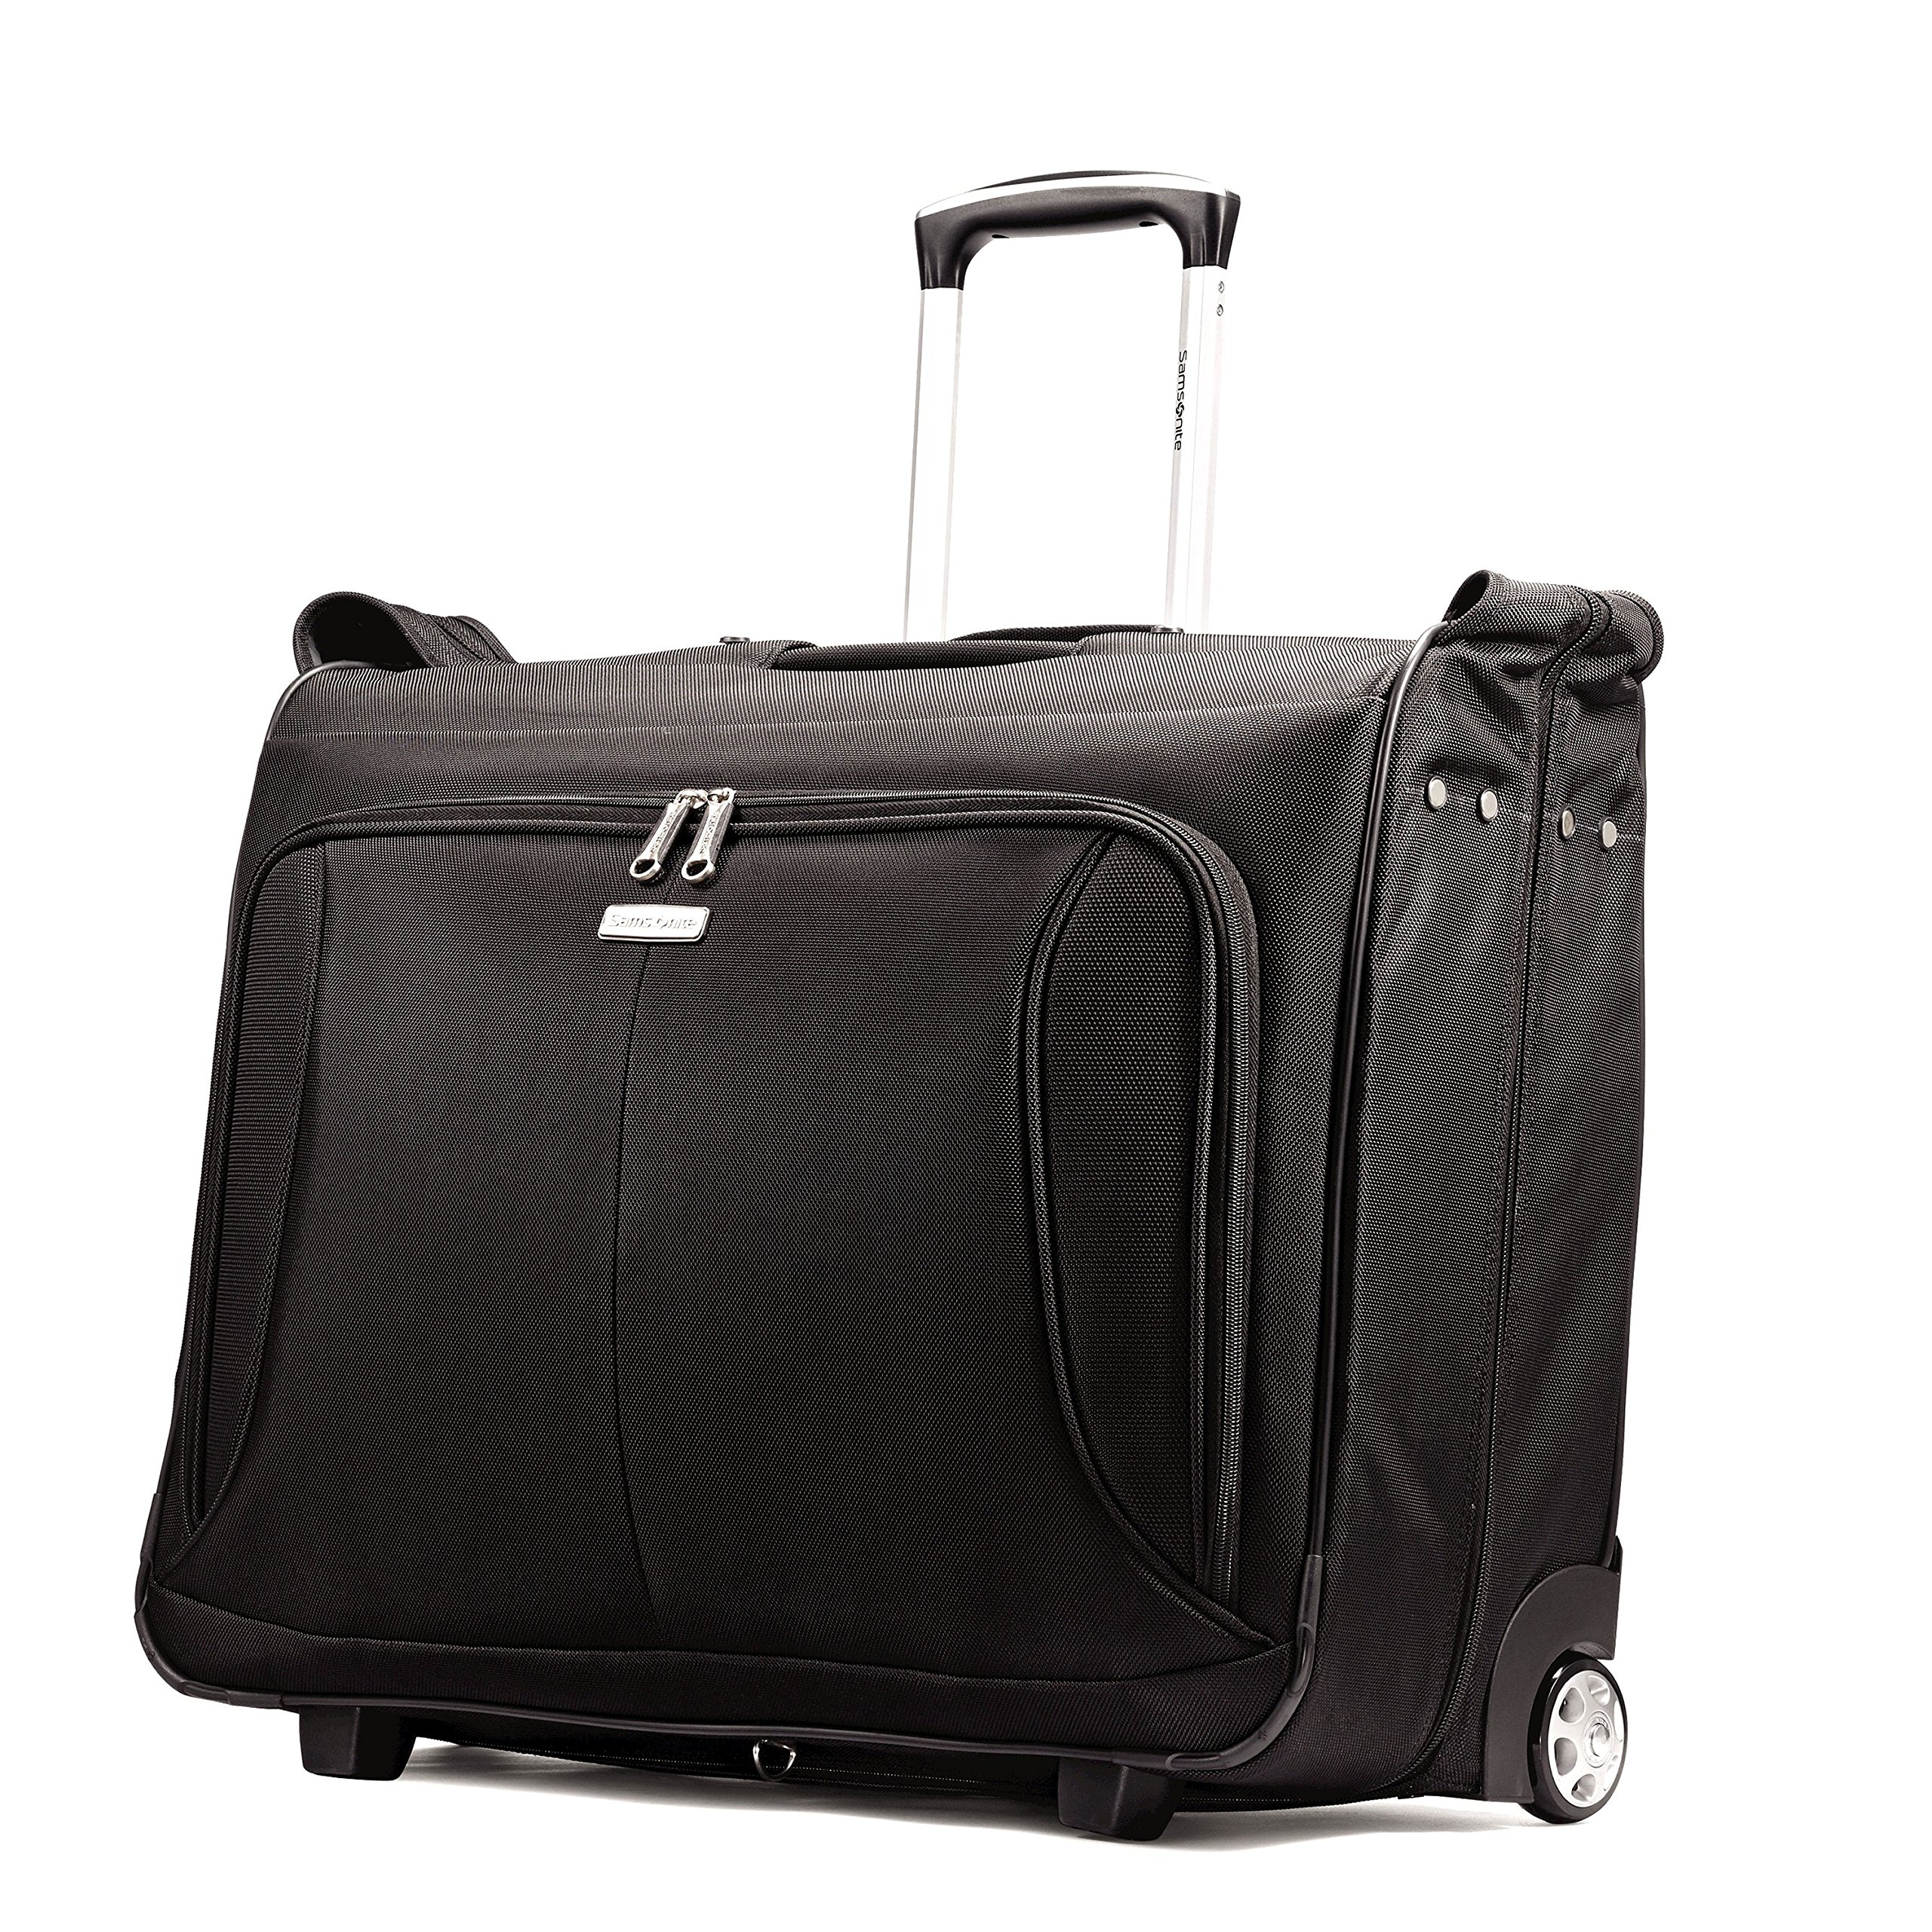 Samsonite Aspire Xlite Wheeled Garment Bag, Black by Samsonite